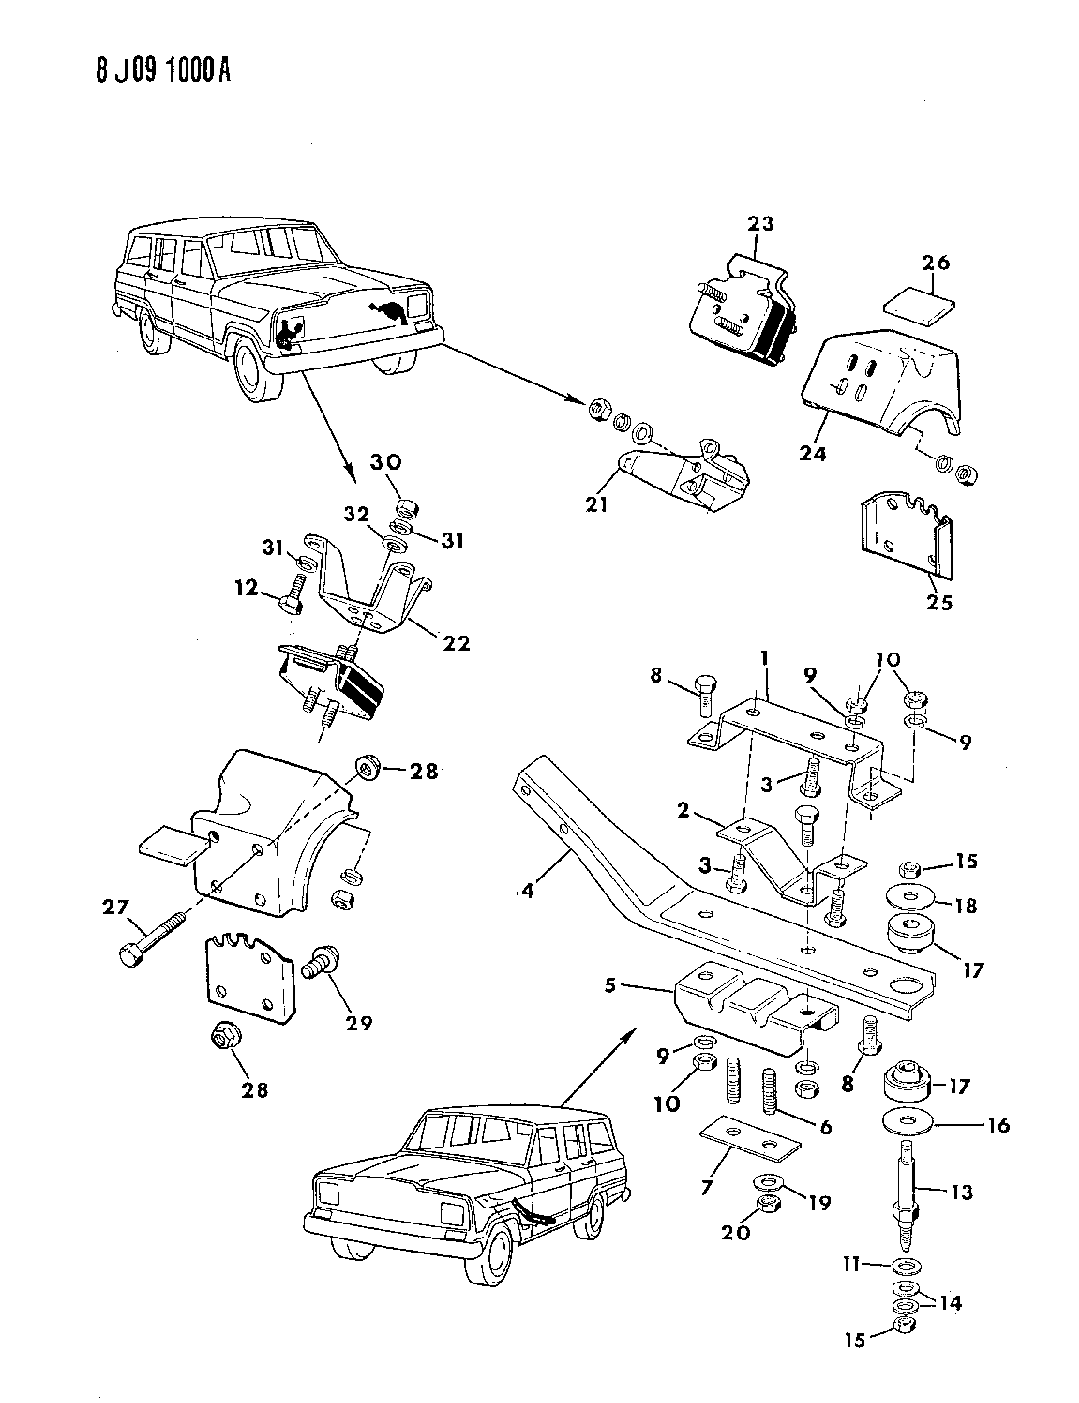 1987 Jeep J20 Engine Mounting - Mopar Parts Giant Jeep J Wiring Harness Diagram on jeep jk wiring harness, jeep grand cherokee wiring harness, jeep cj5 wiring harness, jeep grand wagoneer wiring harness, jeep cj7 wiring harness, jeep commando wiring harness,